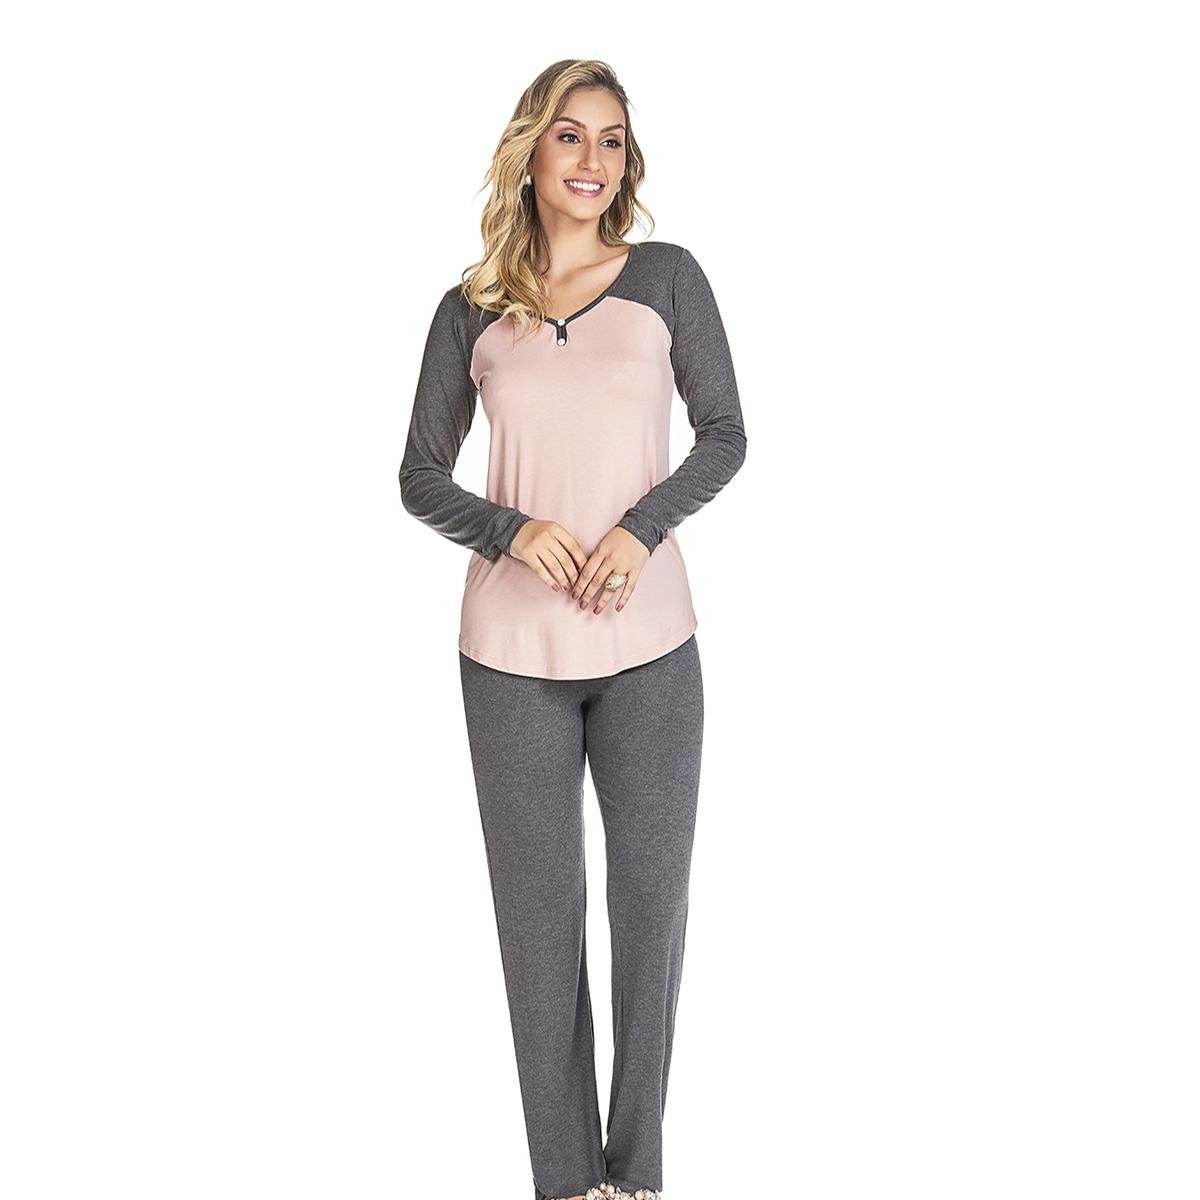 Pijama feminino inverno duas cores viscose